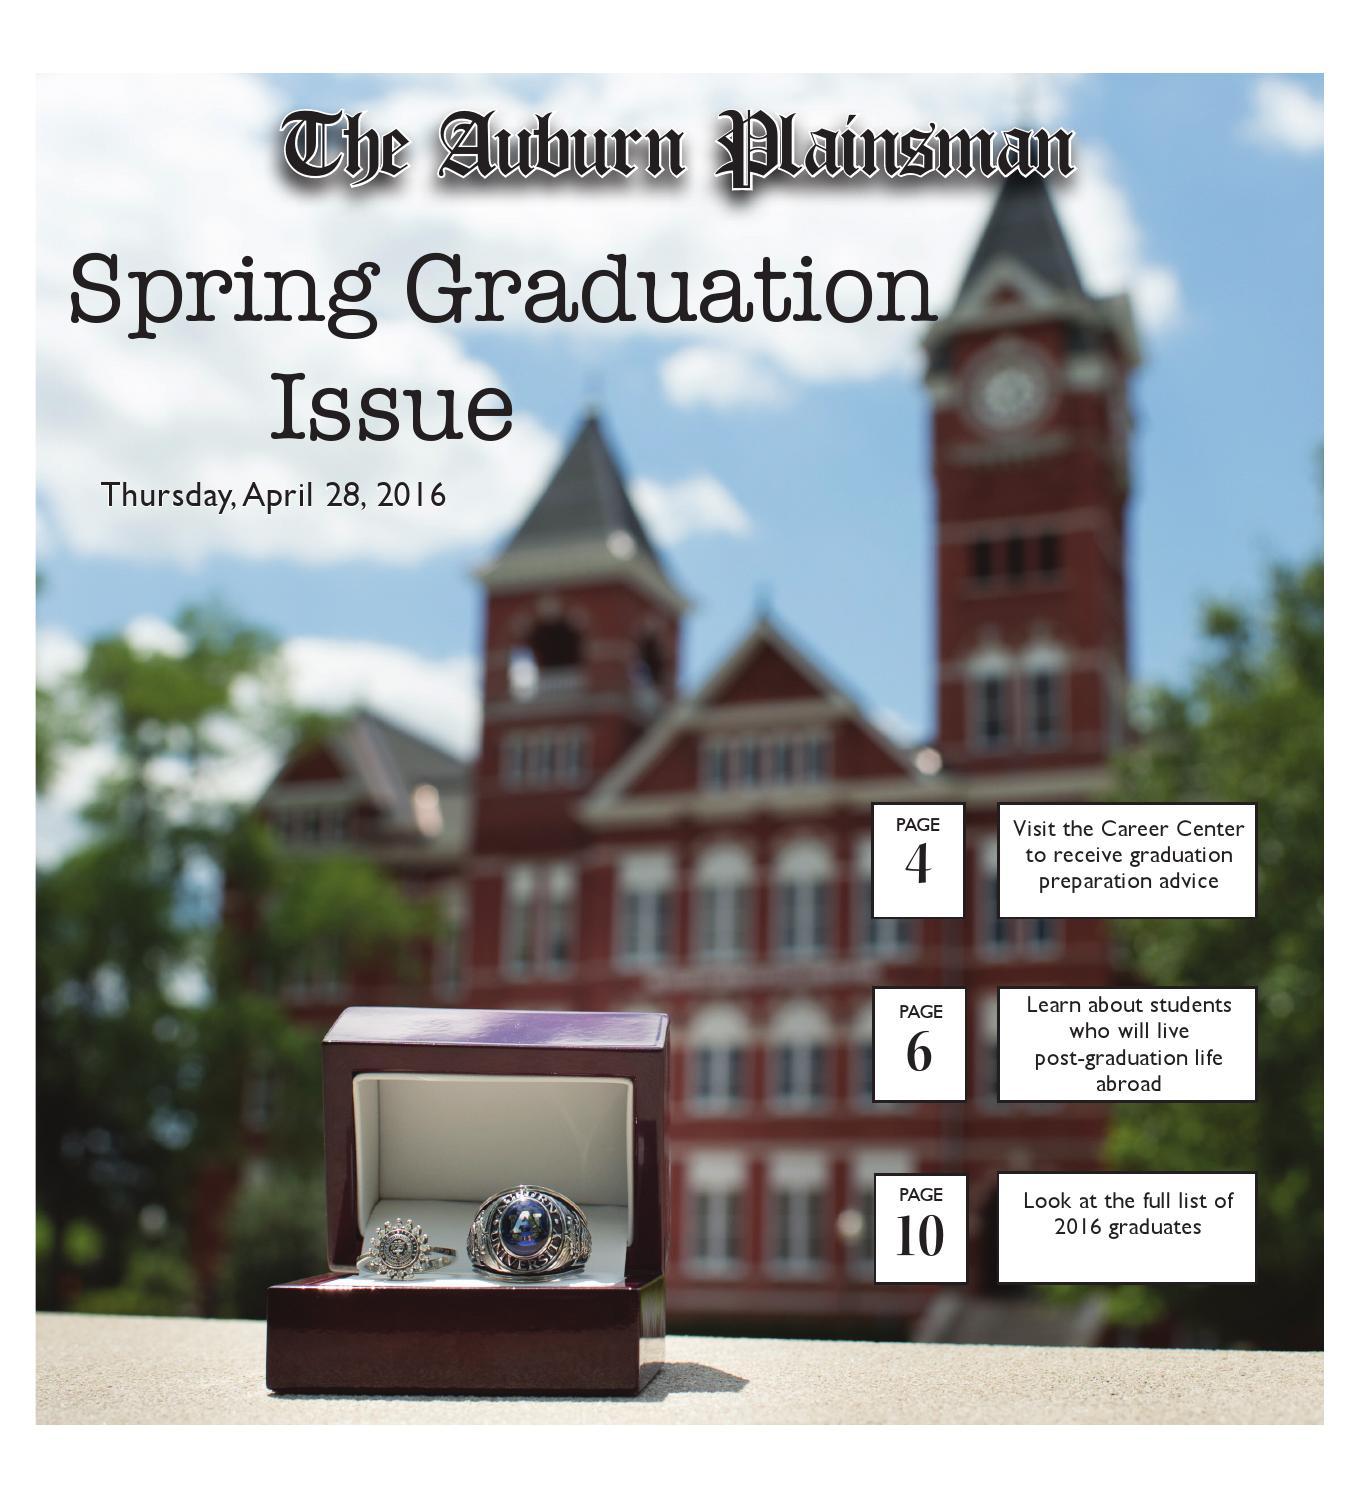 the auburn plainsman spring graduation issue by the the auburn plainsman spring graduation issue 04 30 15 by the auburn plainsman issuu